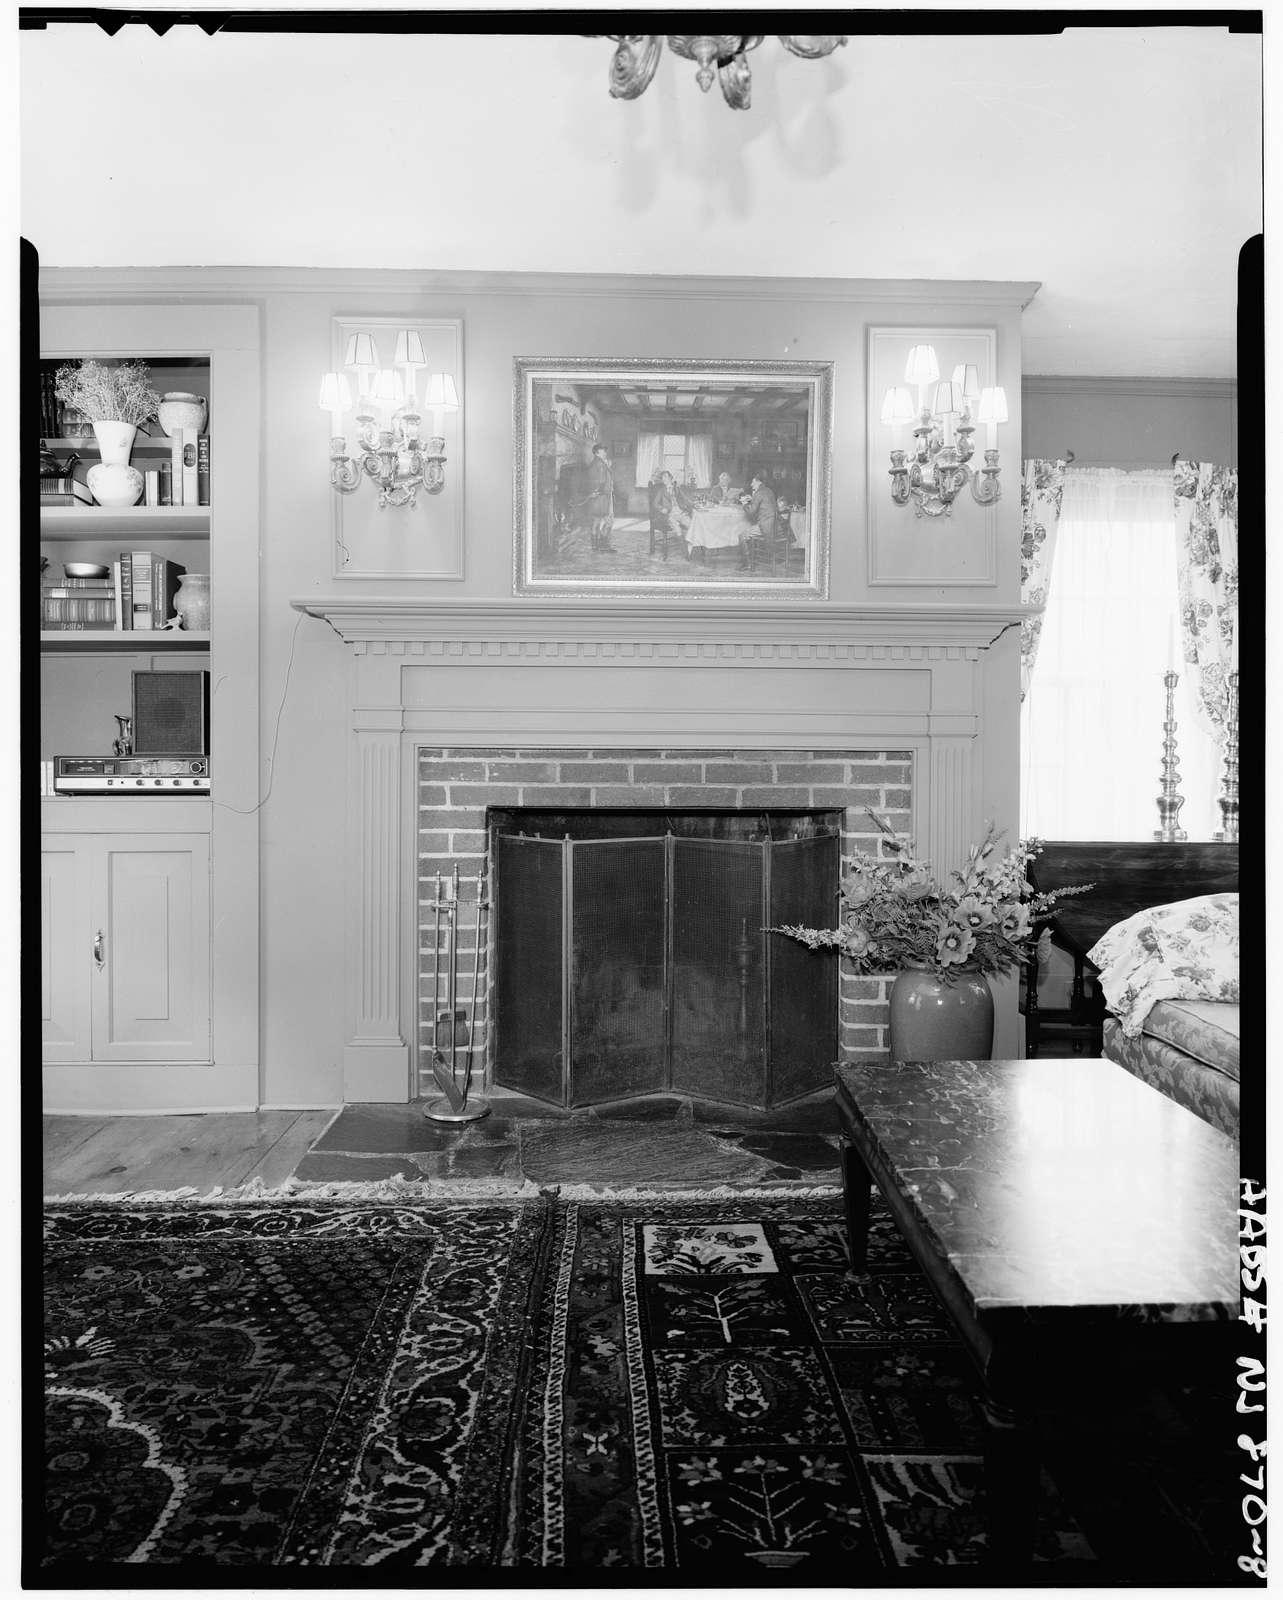 Fosberg-Sisco House, 3 Edgemont Road, Wayne, Passaic County, NJ